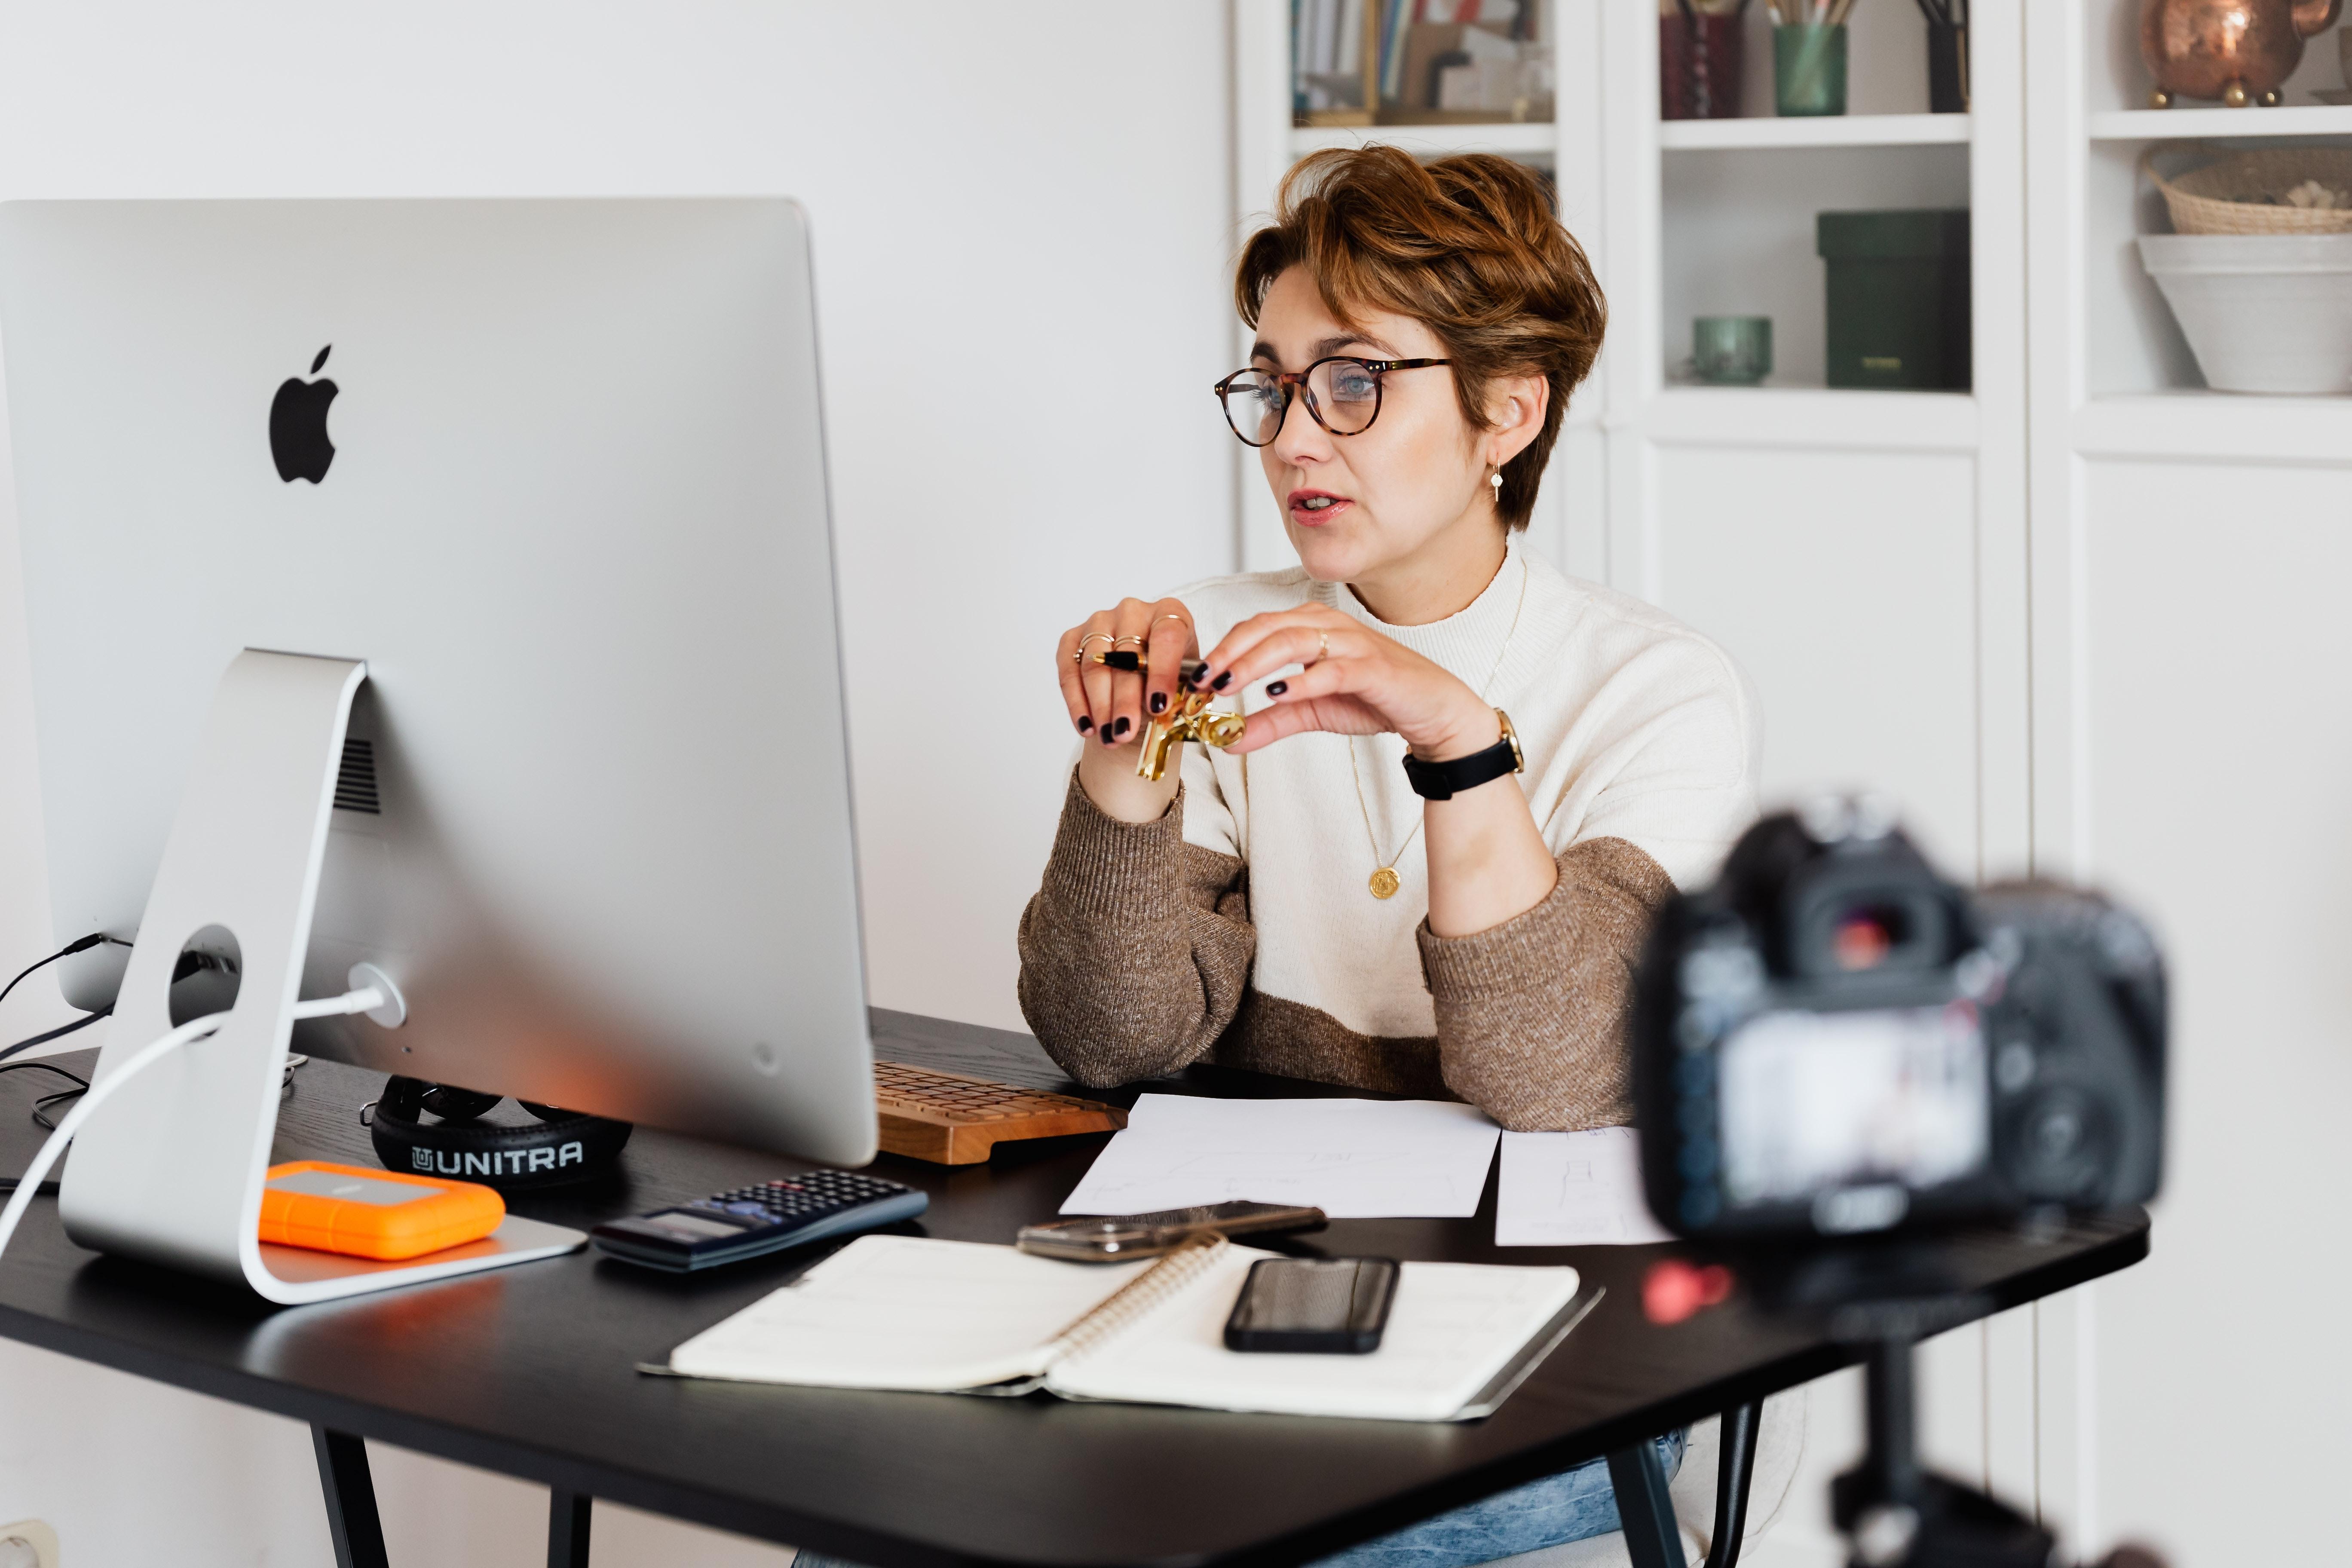 Online English Teacher, Part Time Advert Image